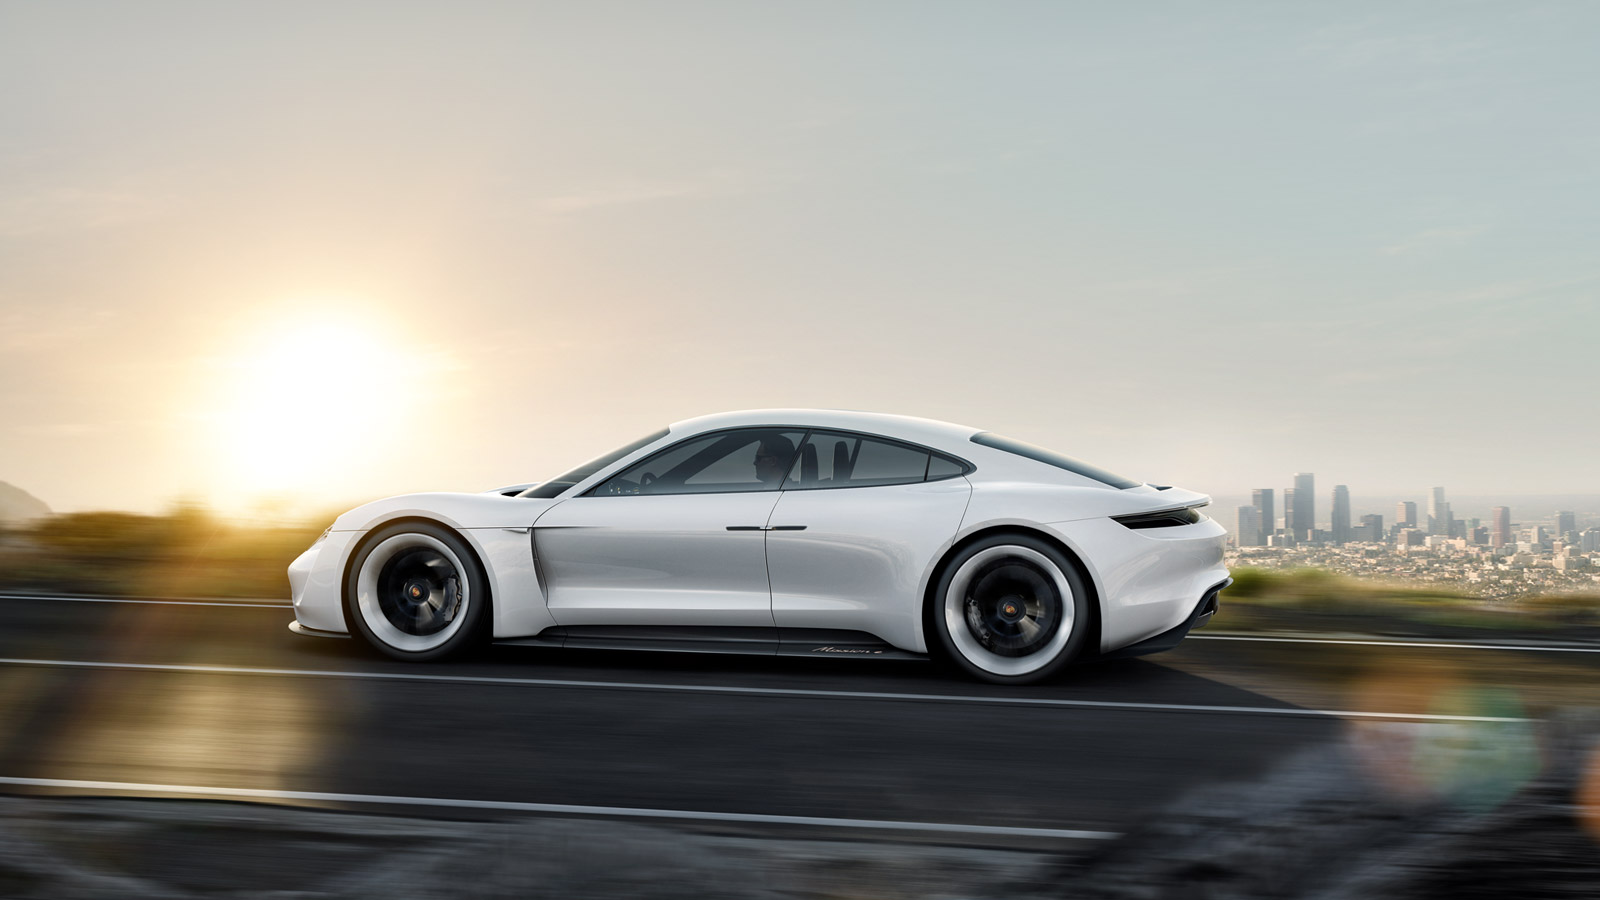 Porsche S Mission E Concept Car Electrifies Frankfurt Motor Show Techgage